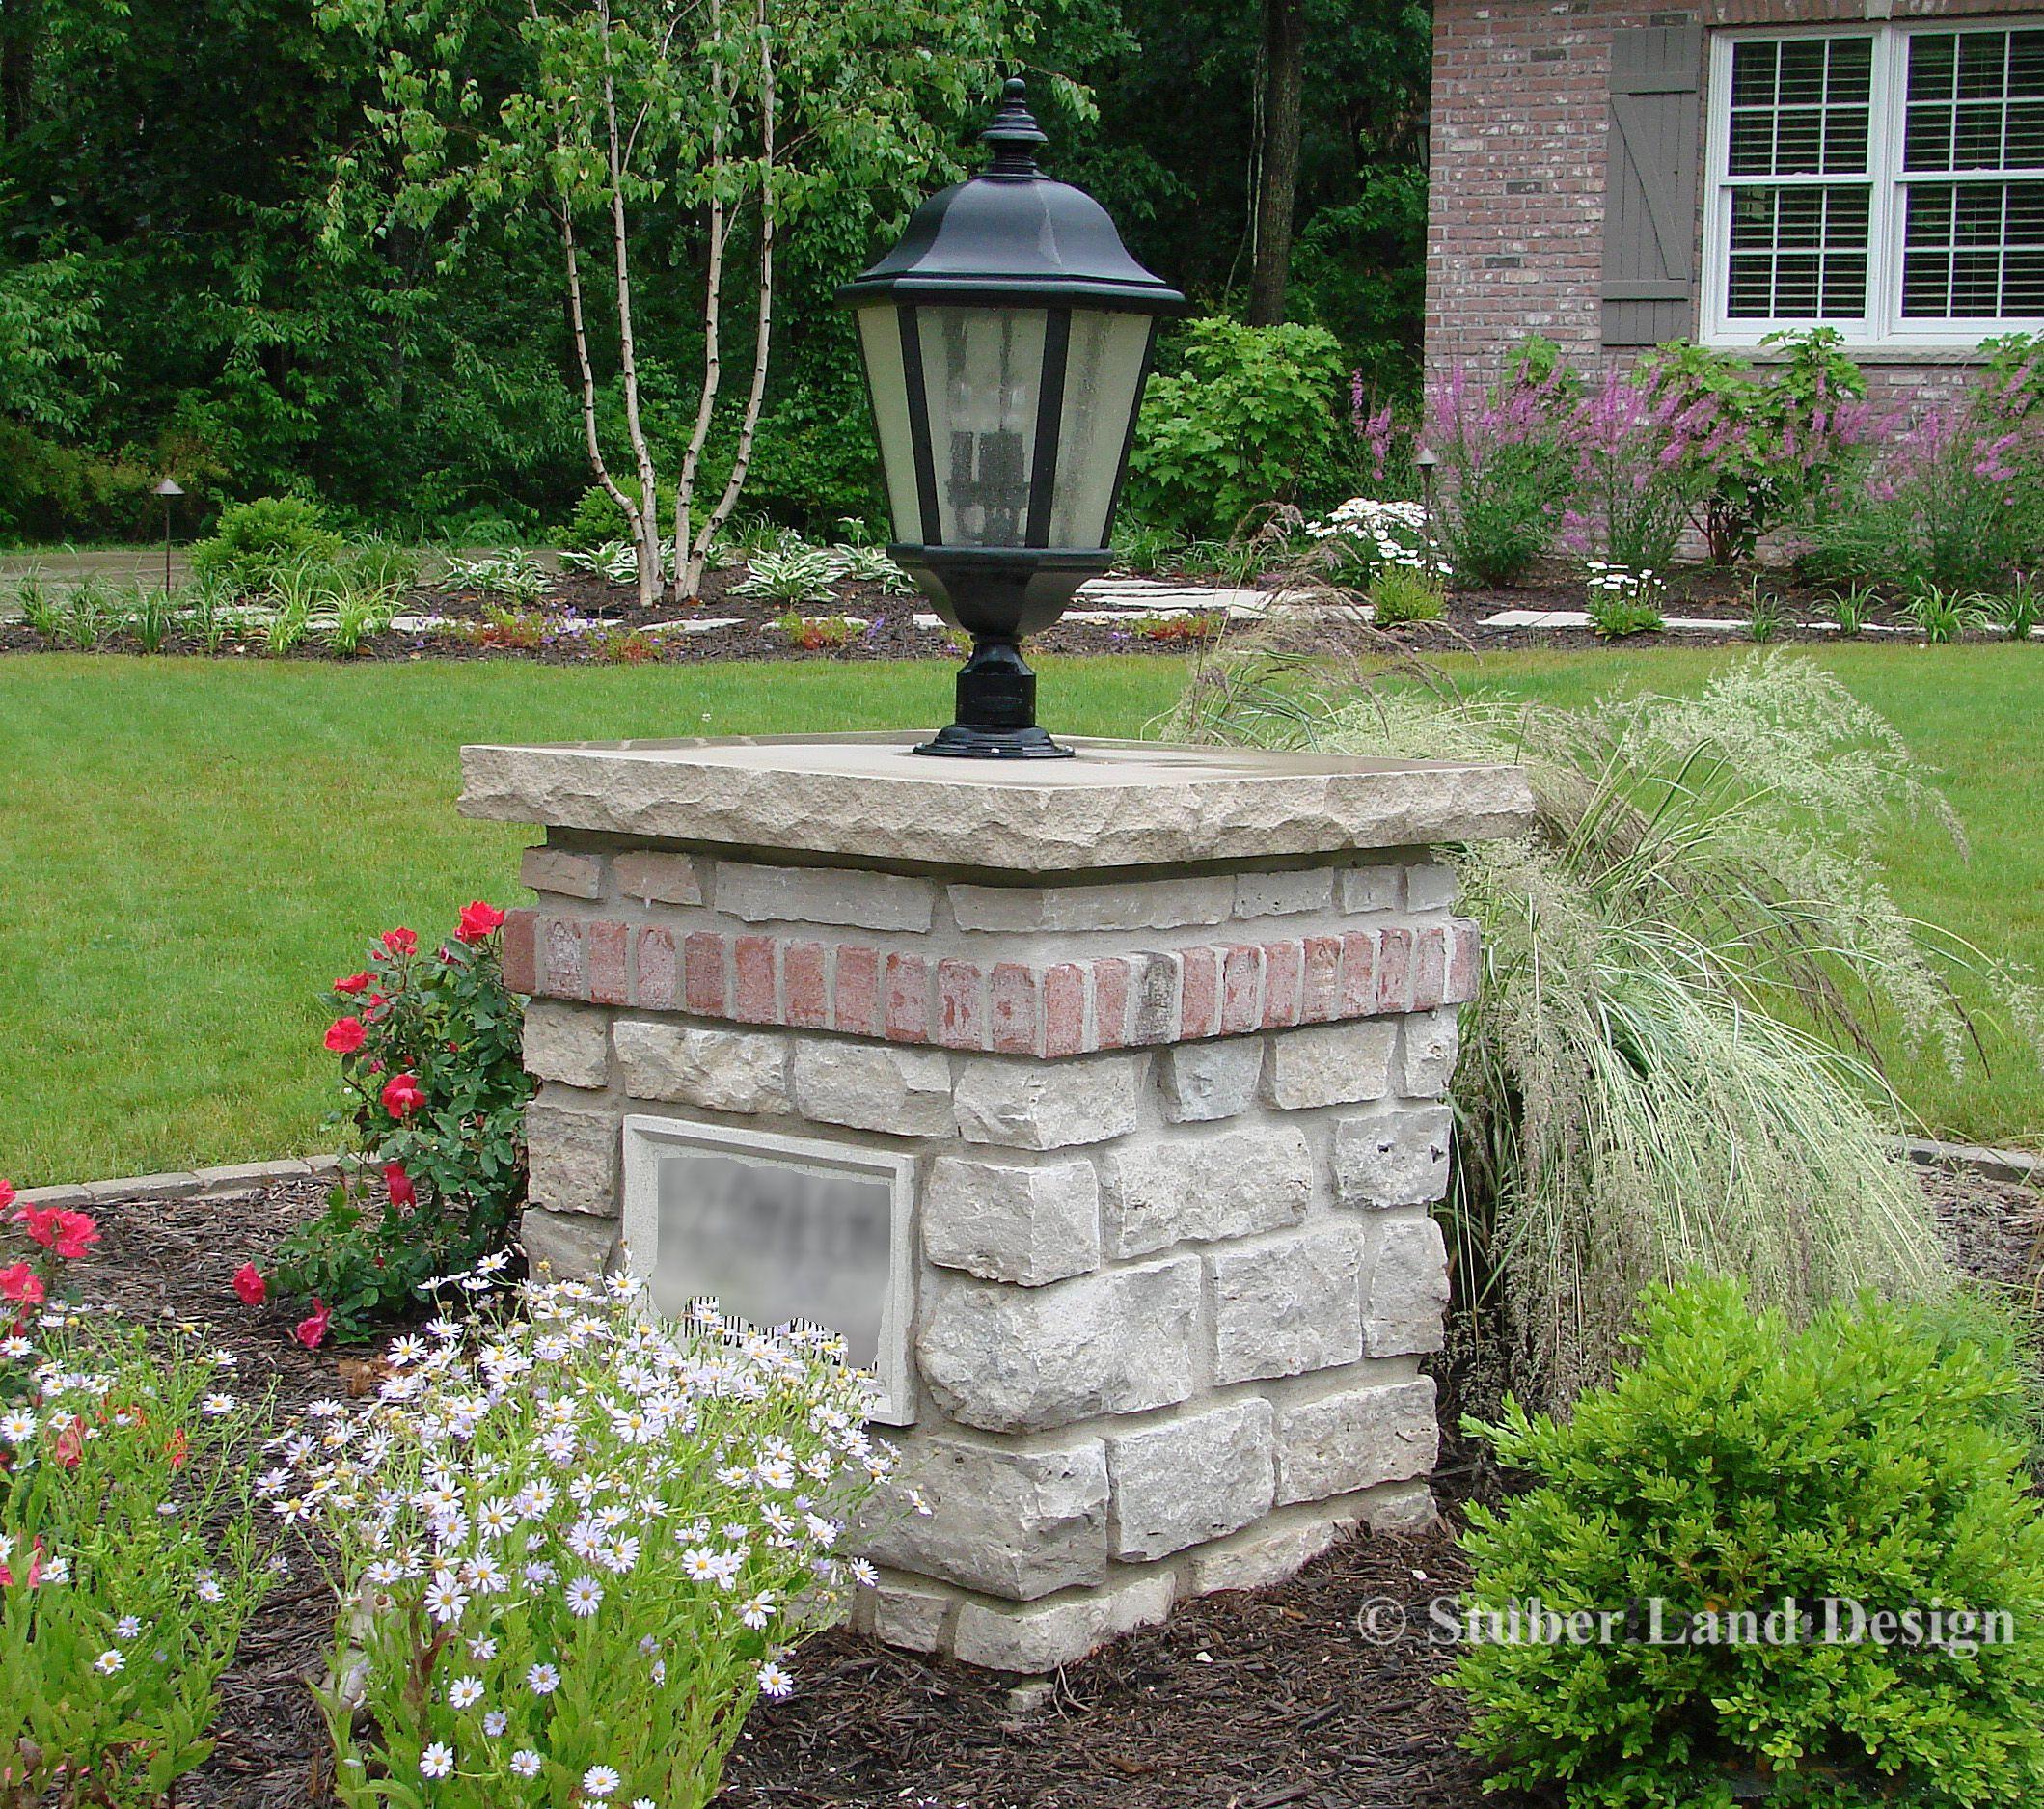 mortared natural stone pillar with